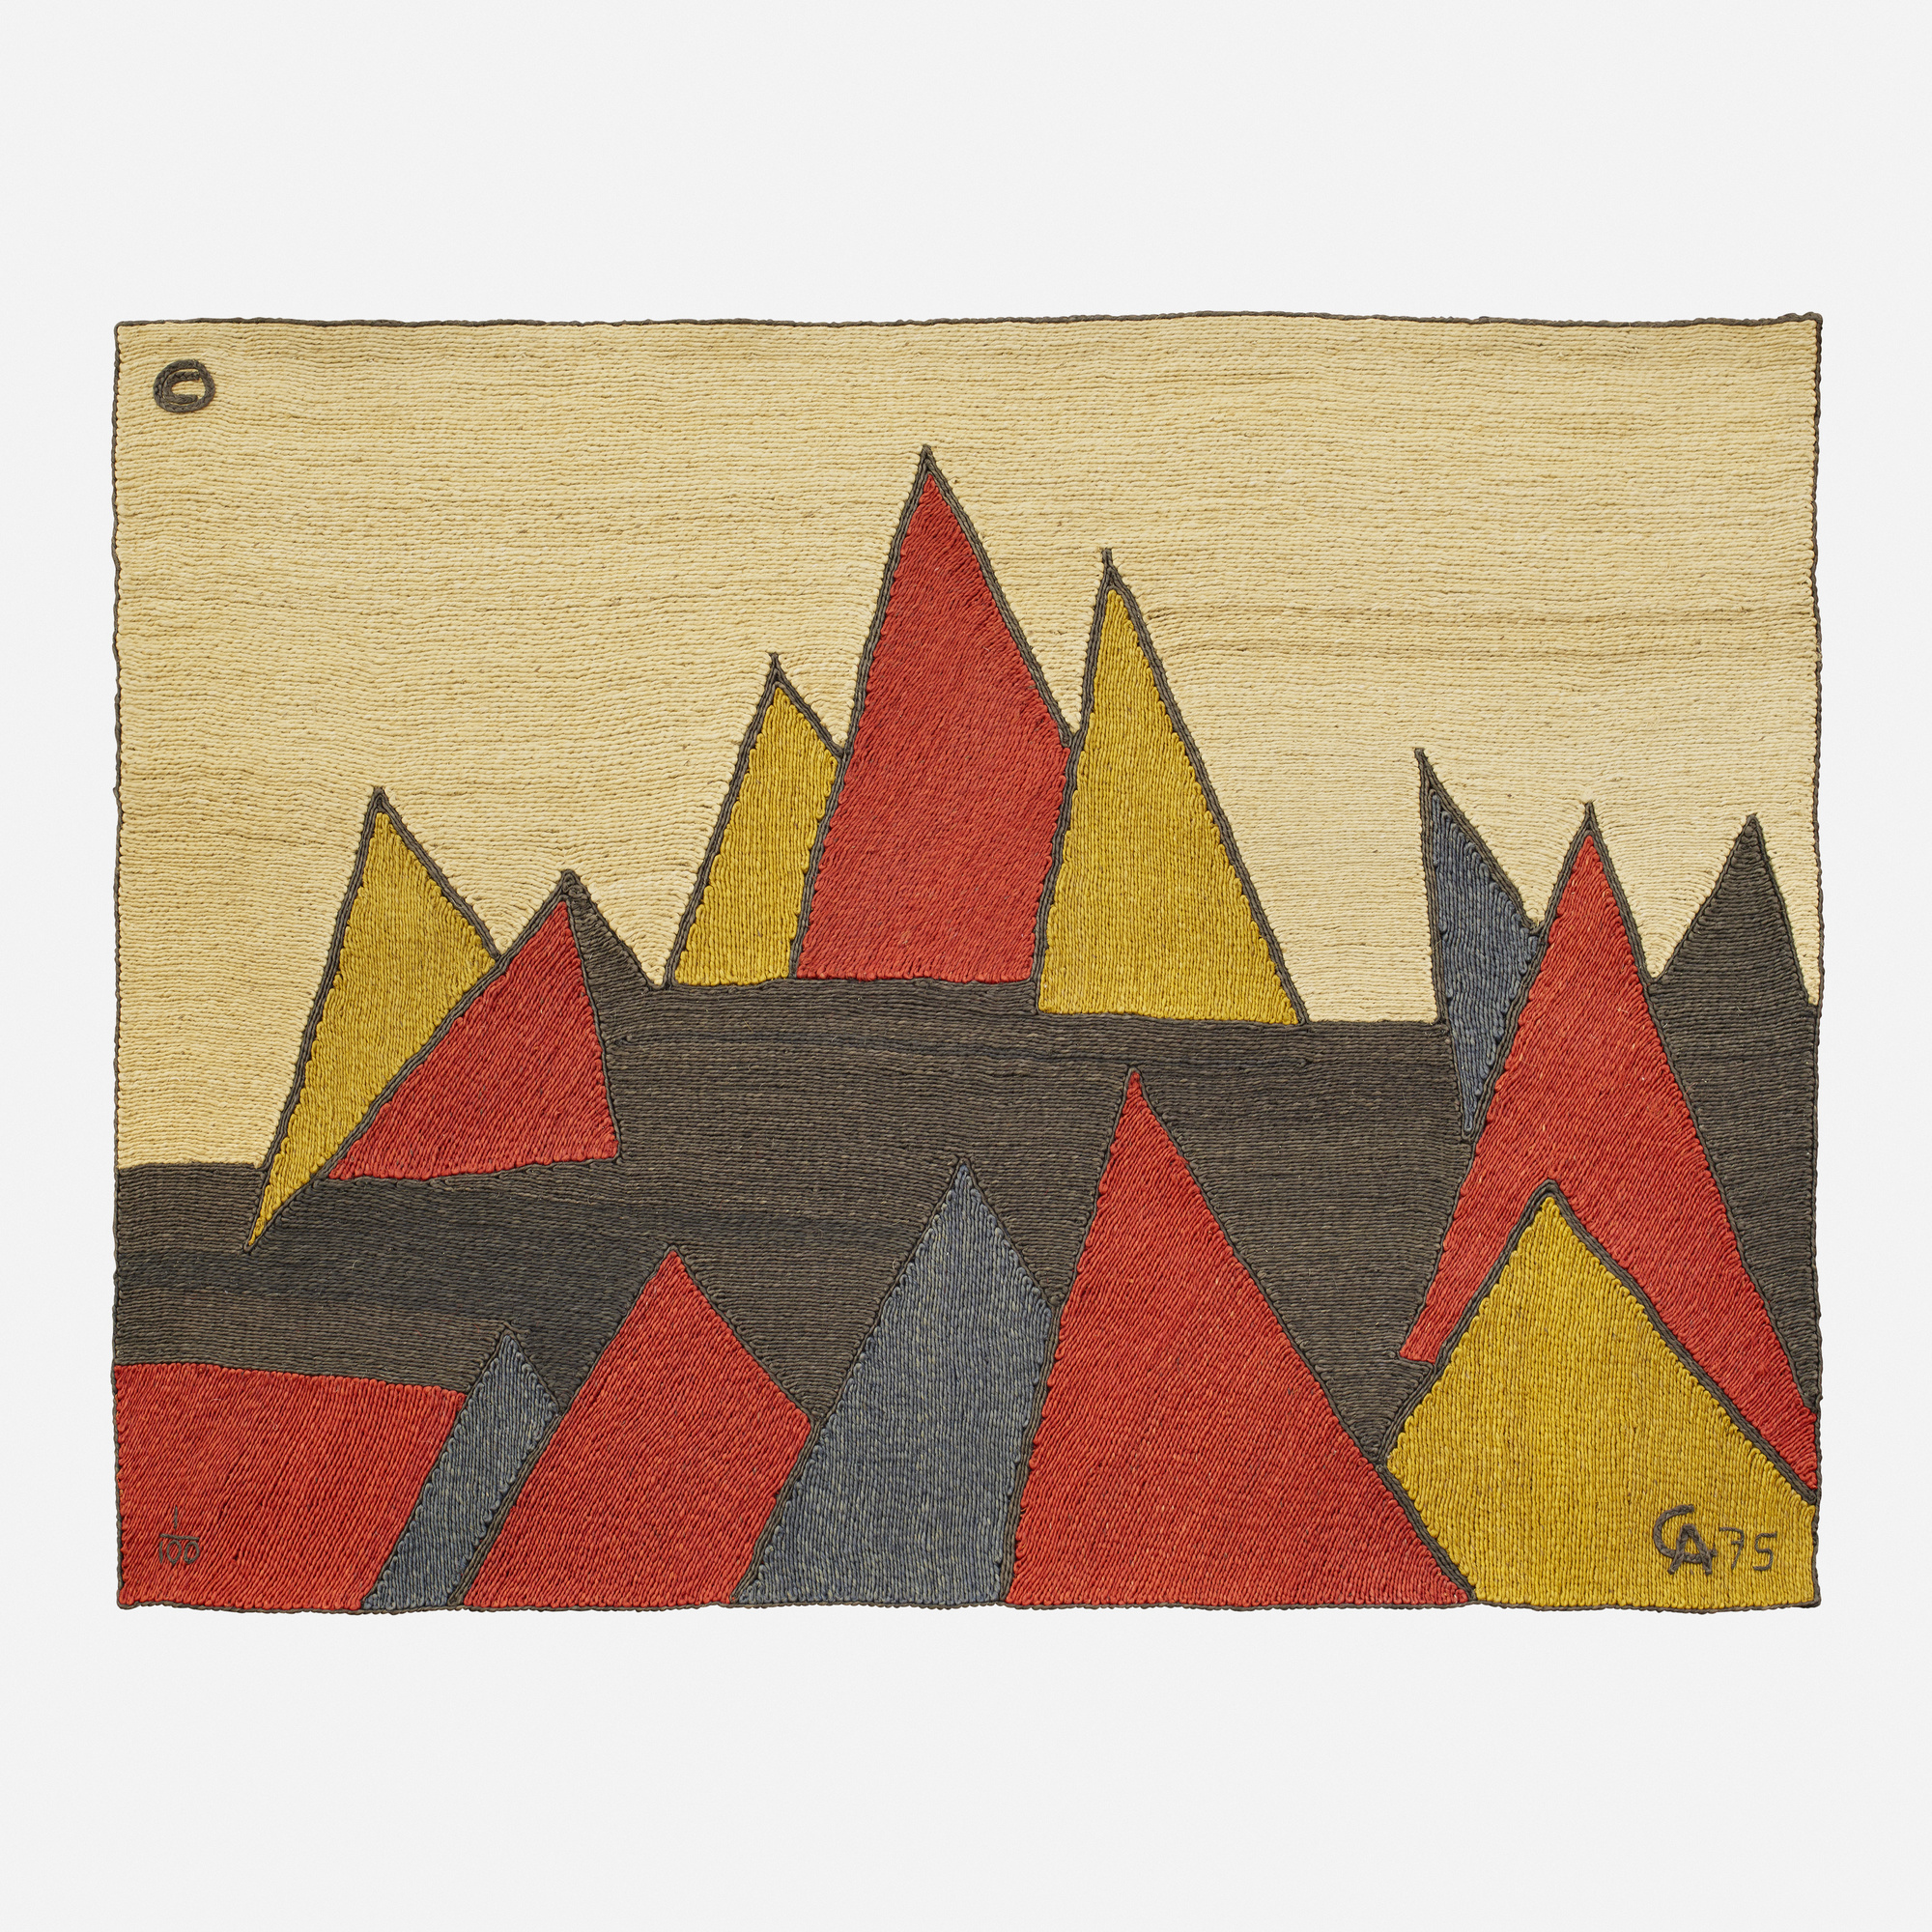 360: After Alexander Calder / Pyramid tapestry (1 of 1)